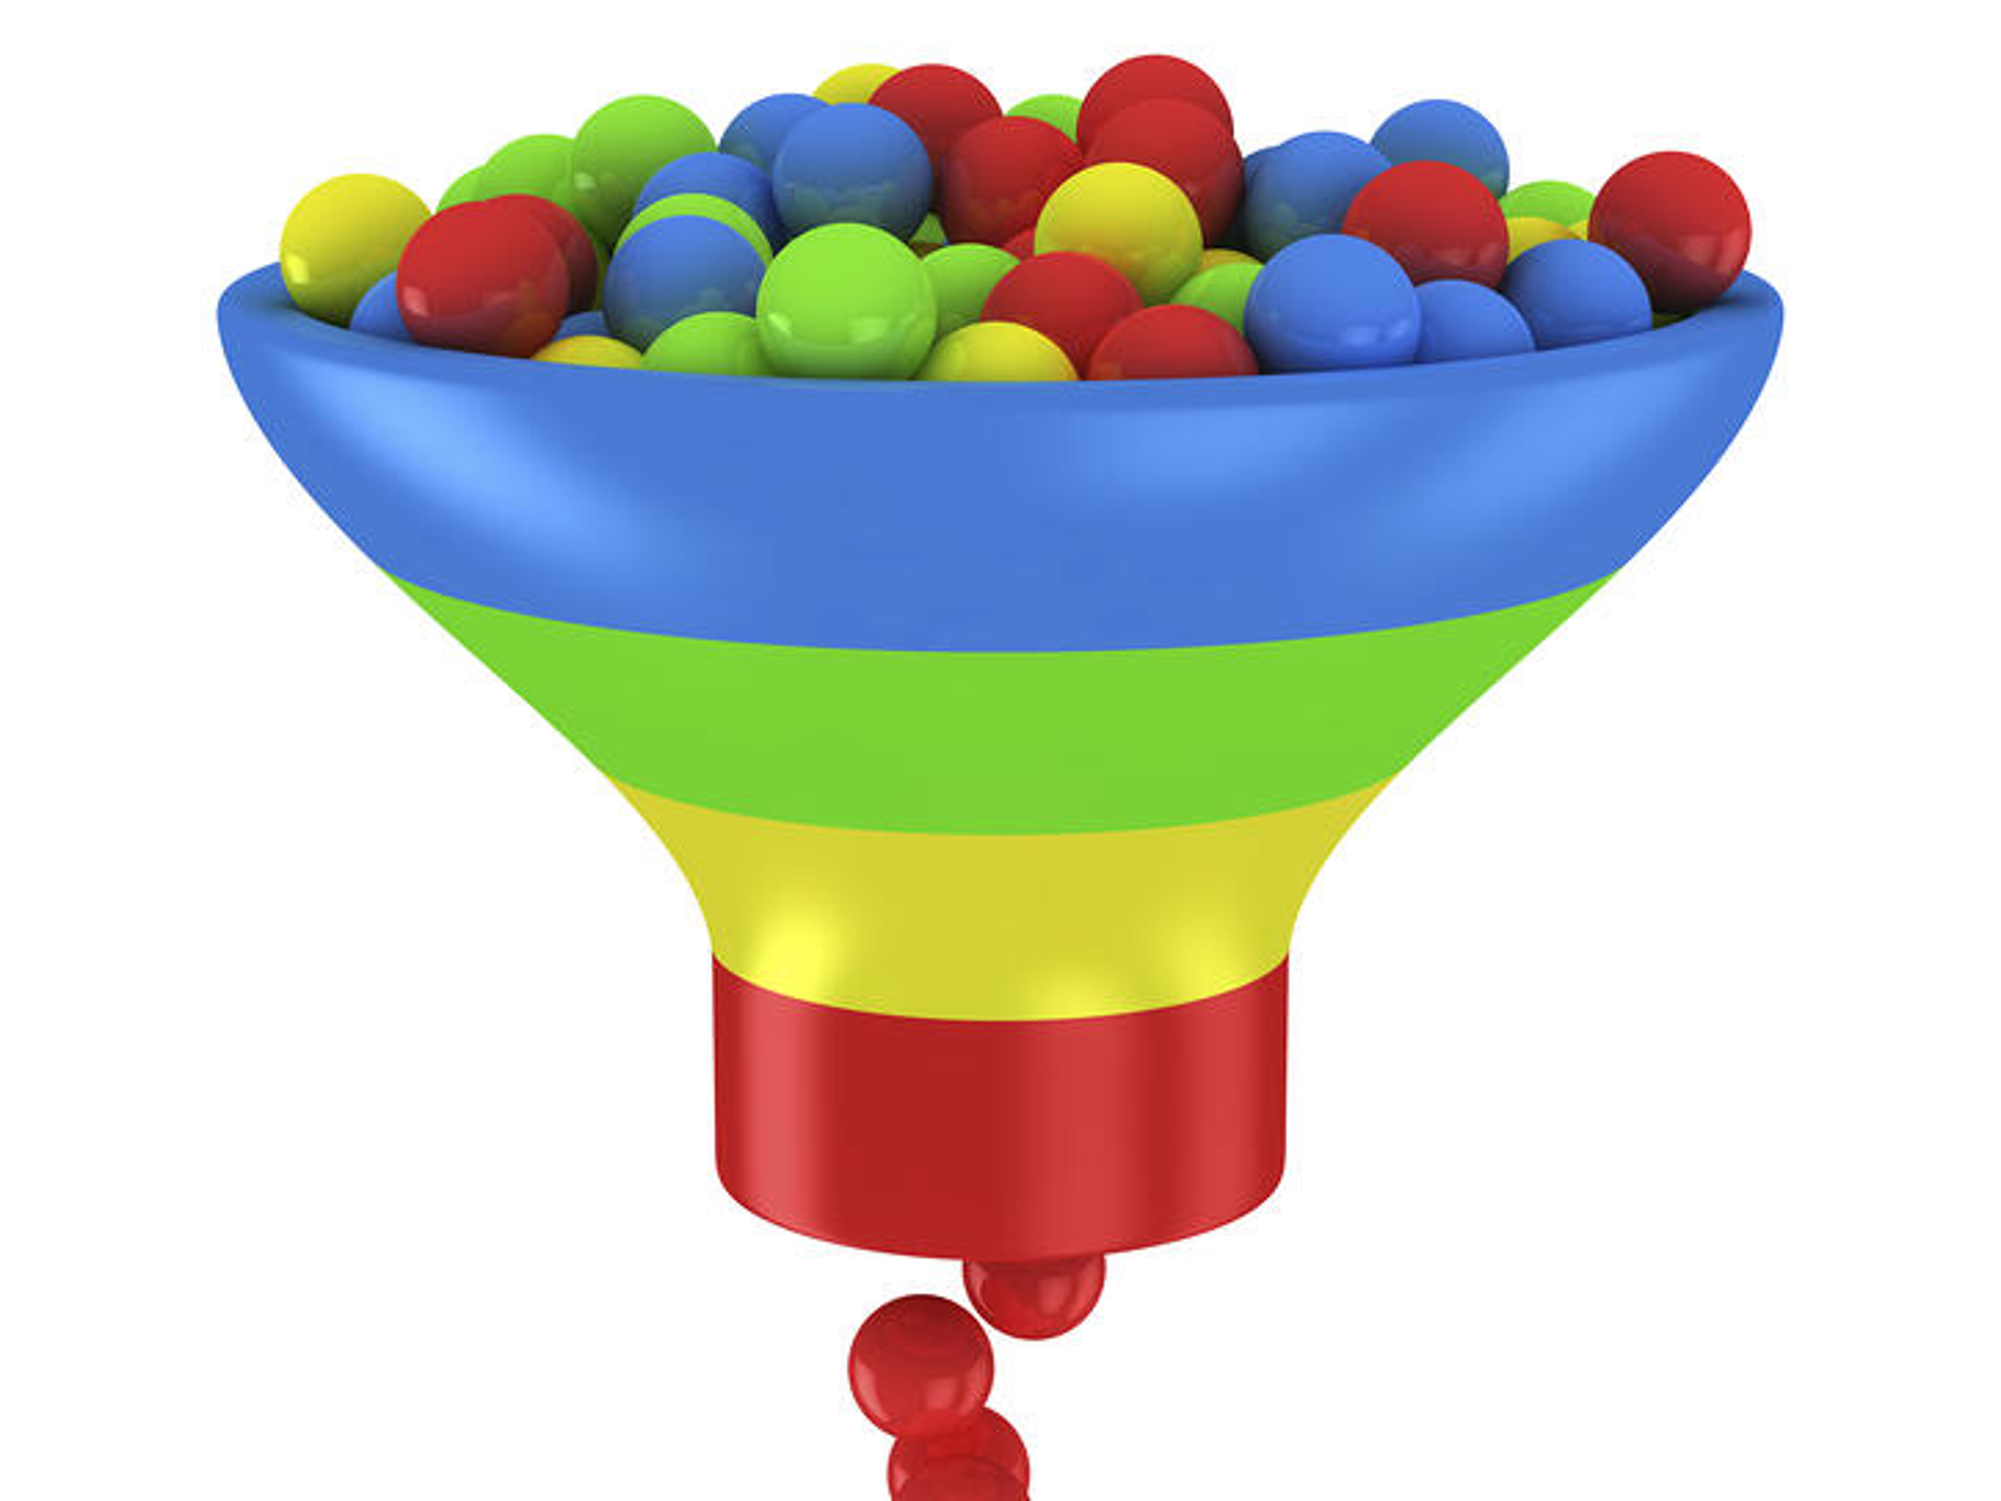 sales_management_funnel.jpeg